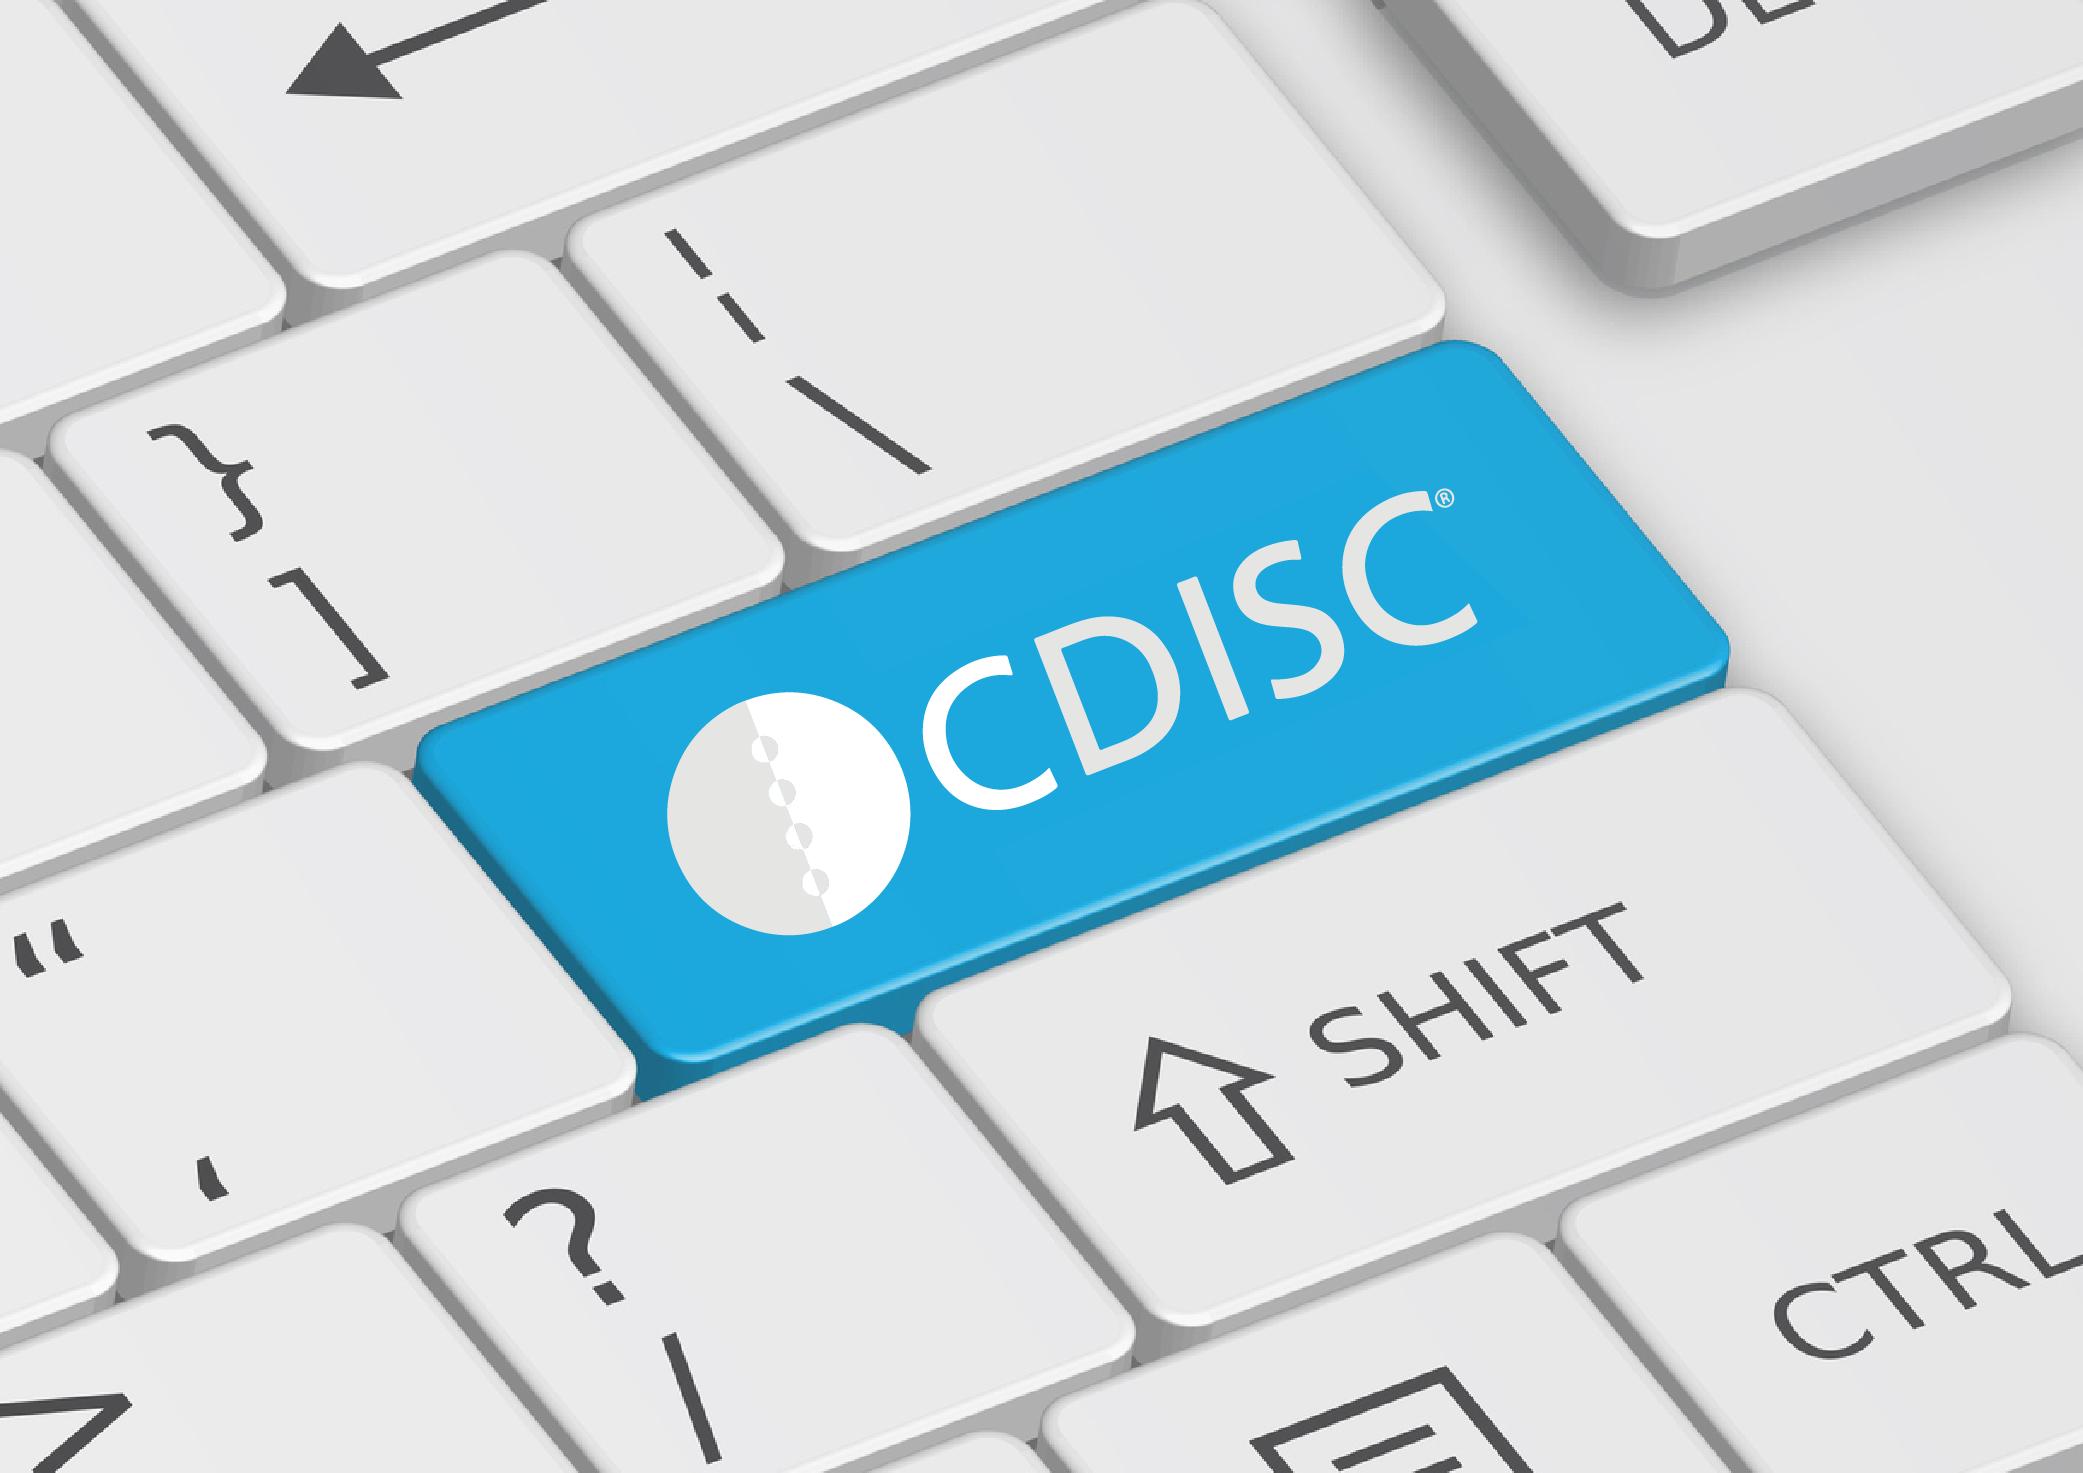 cdisc keyboard.png